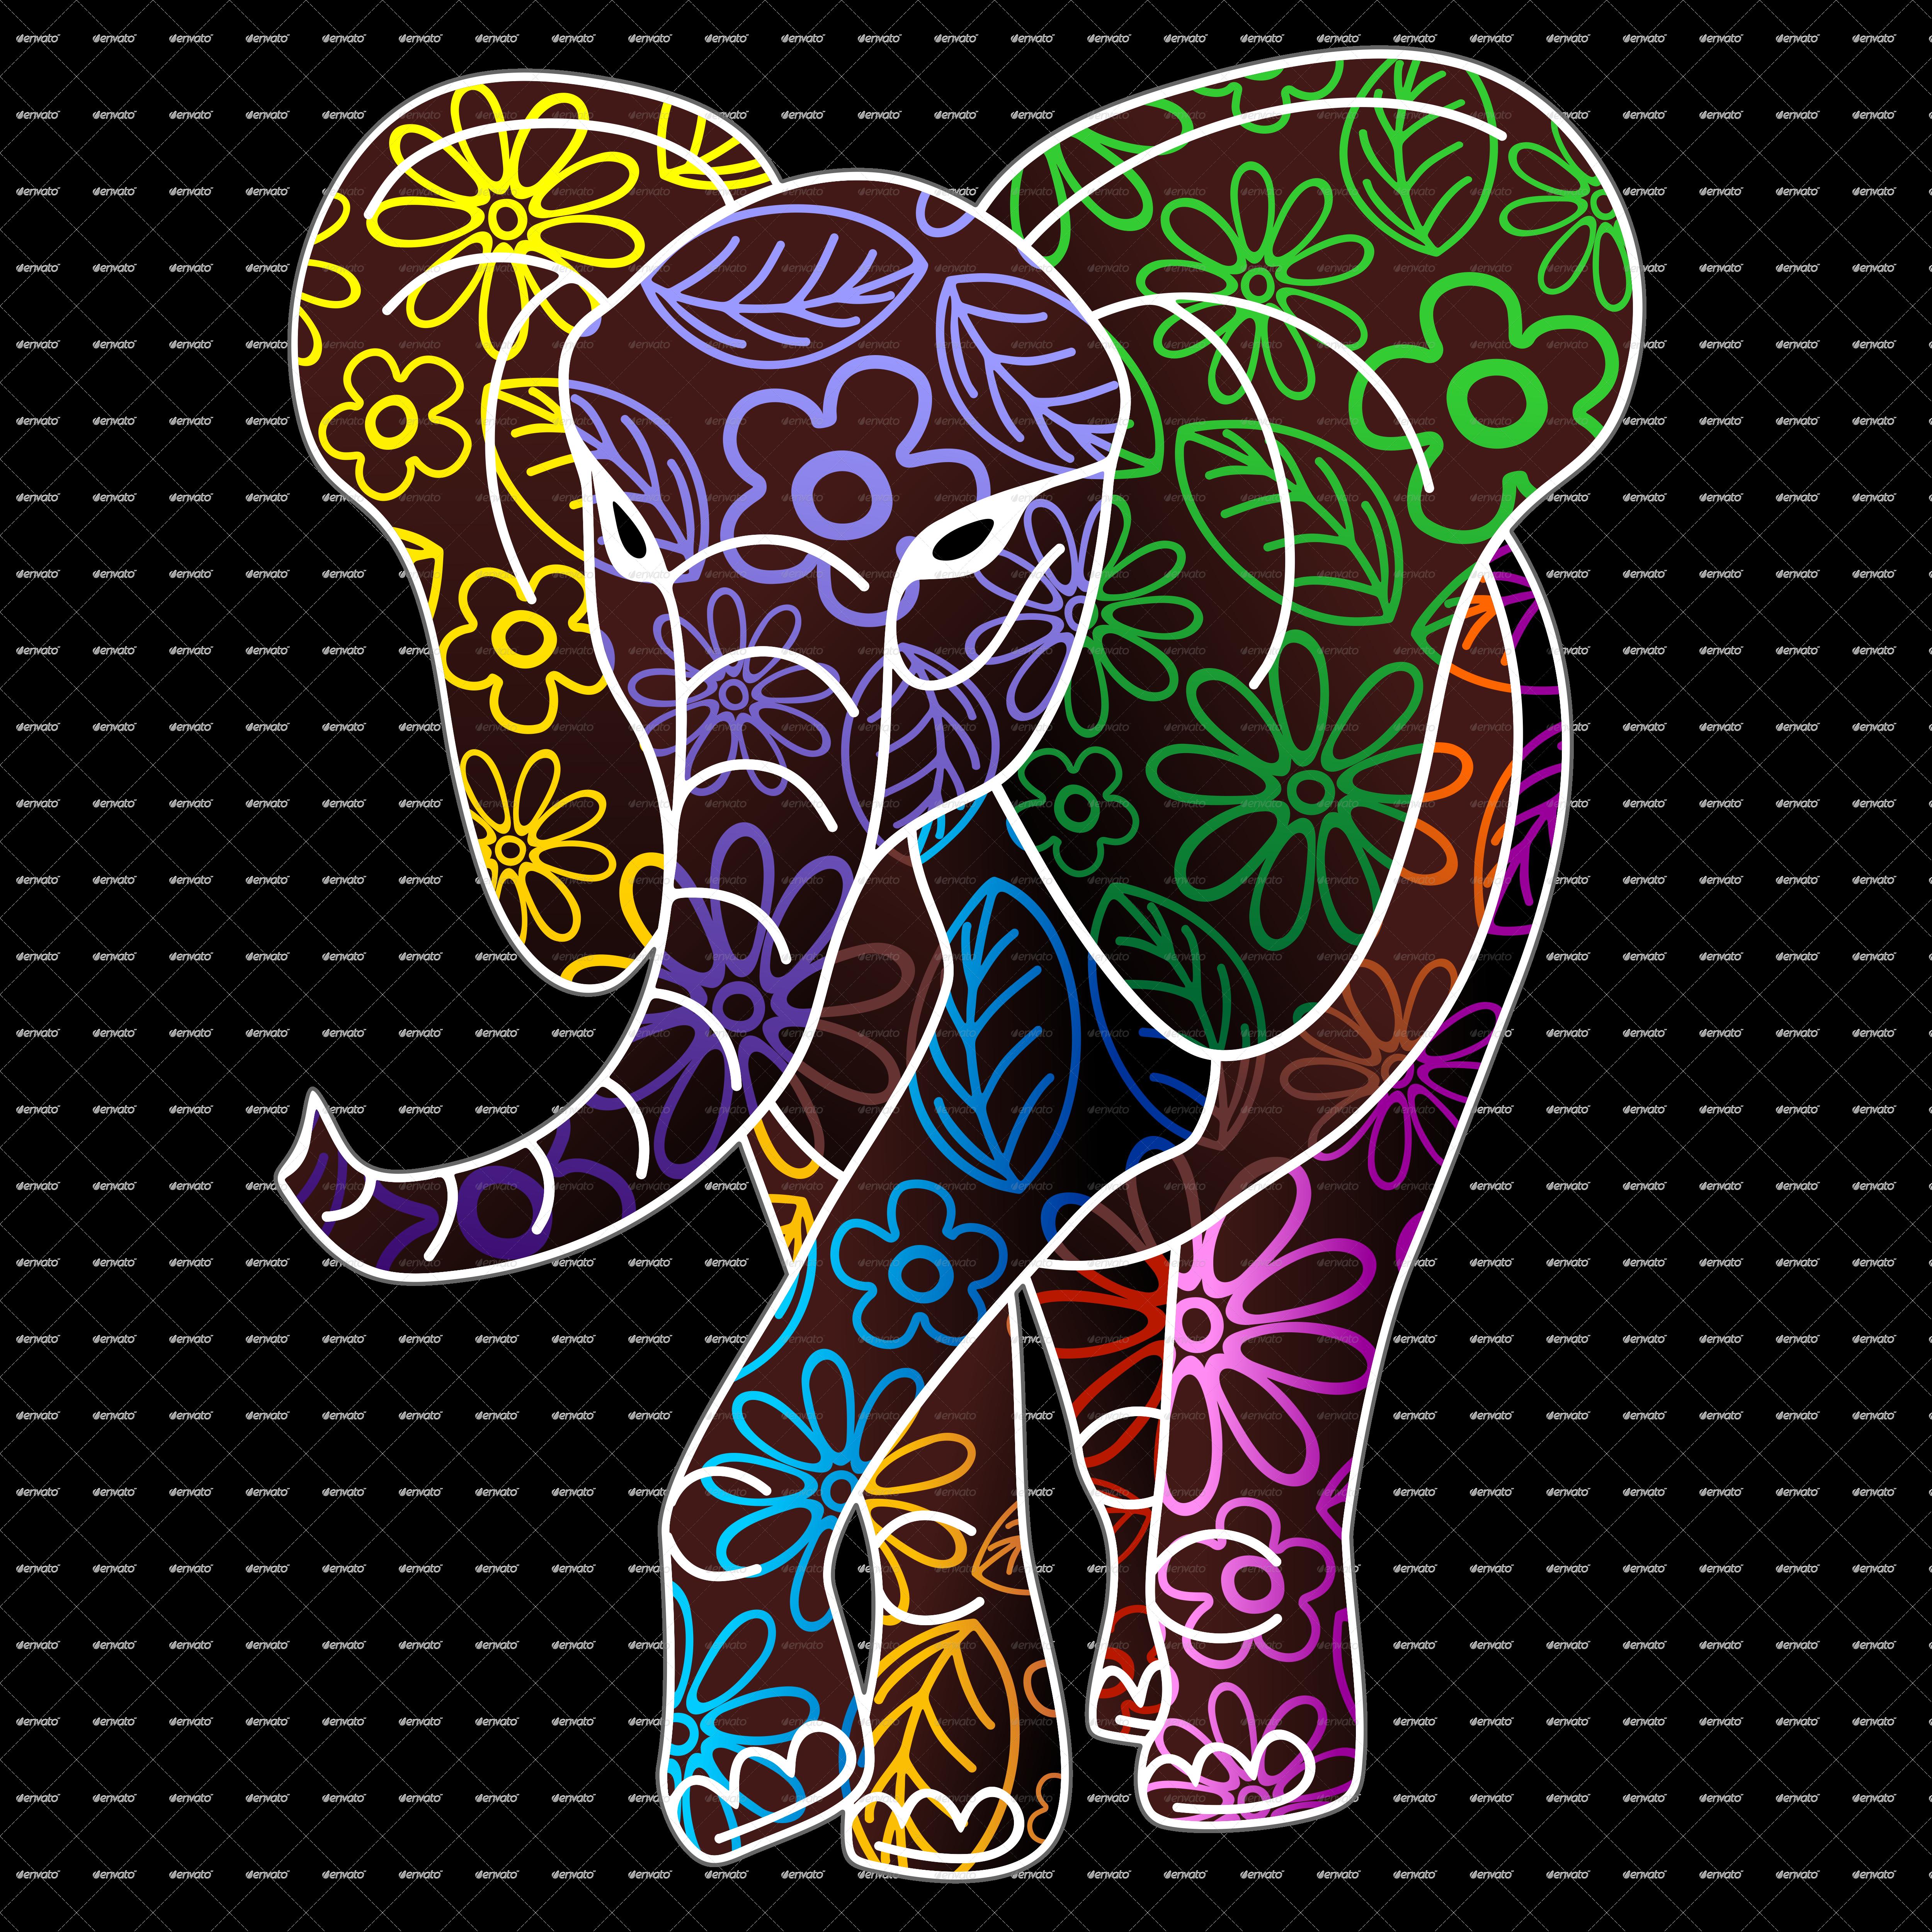 Elephant Floral Batik Art Design by Bluedarkat | GraphicRiver